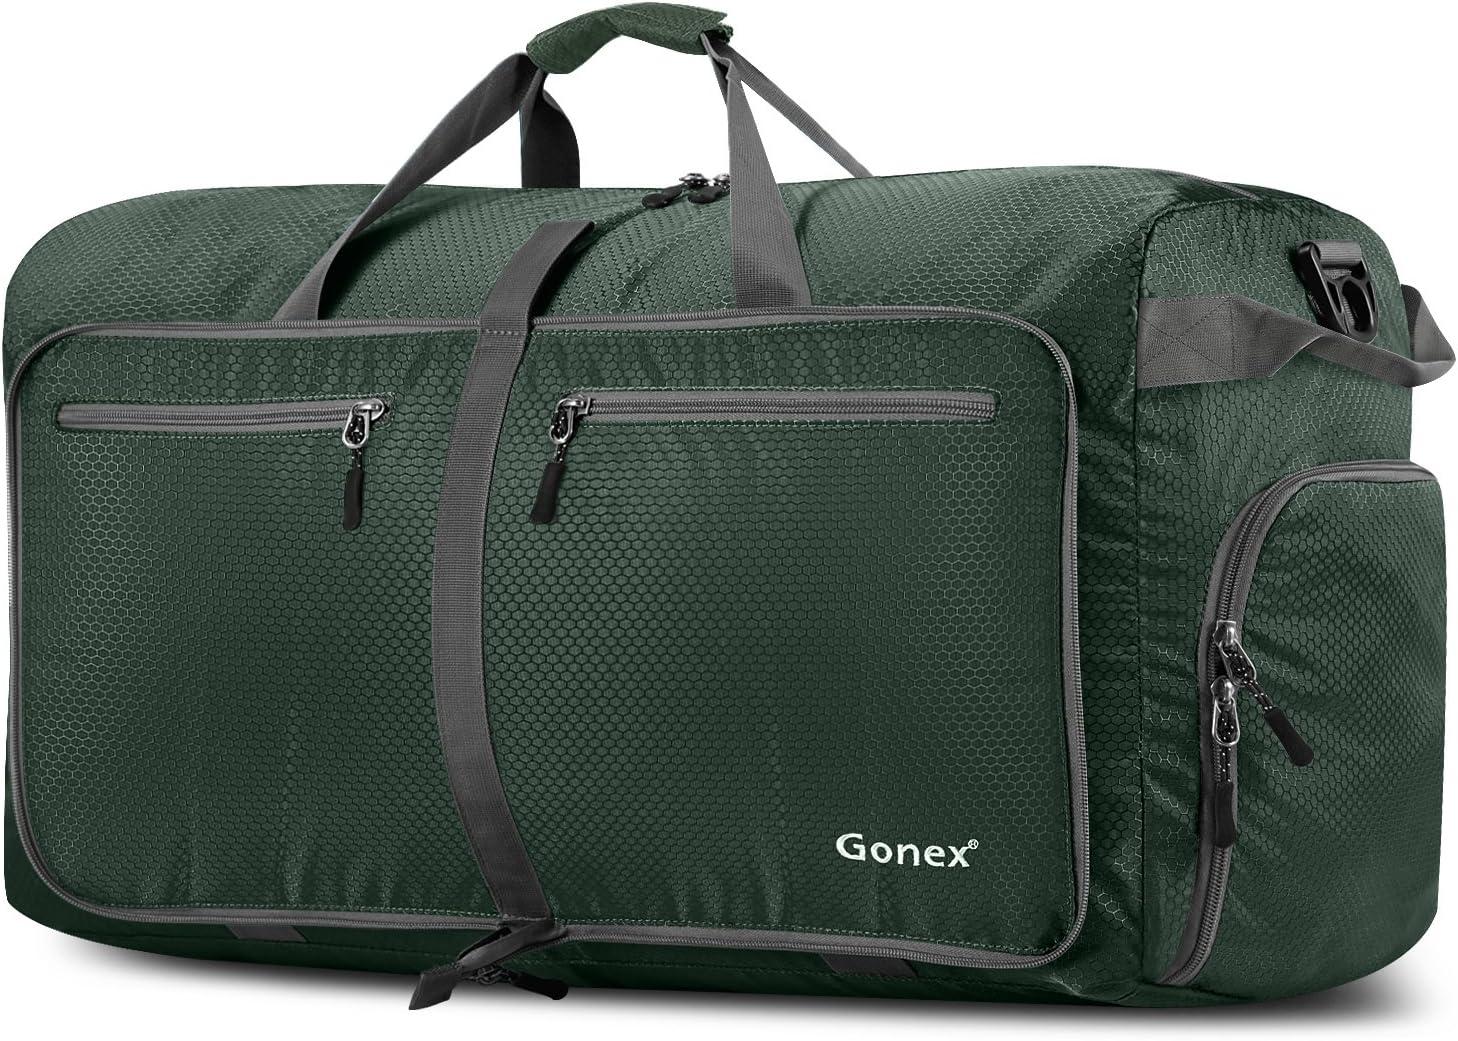 Gonex - Bolsa de Equipaje/Viaje de Duffel Plegable Impermeable y Resistente 100L Travel Bag para Viaje/Deporte Verde Oscuro